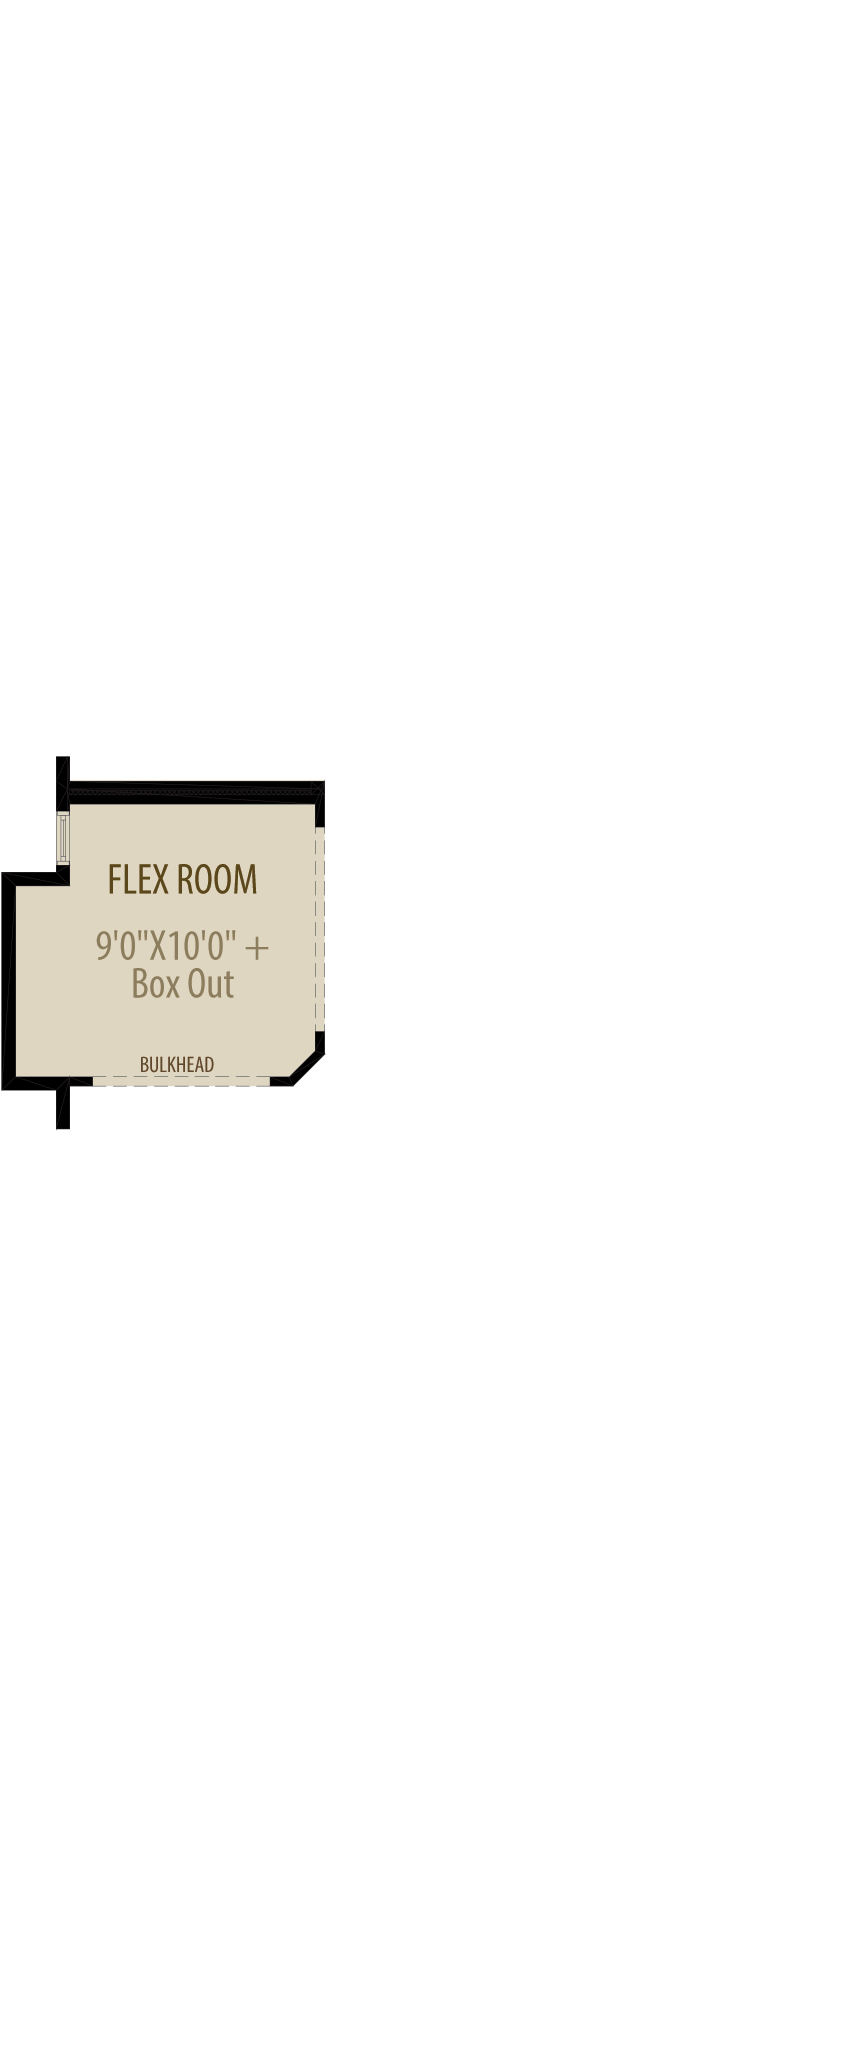 Flex Room Cantilever (Adds 16 Sq Ft)